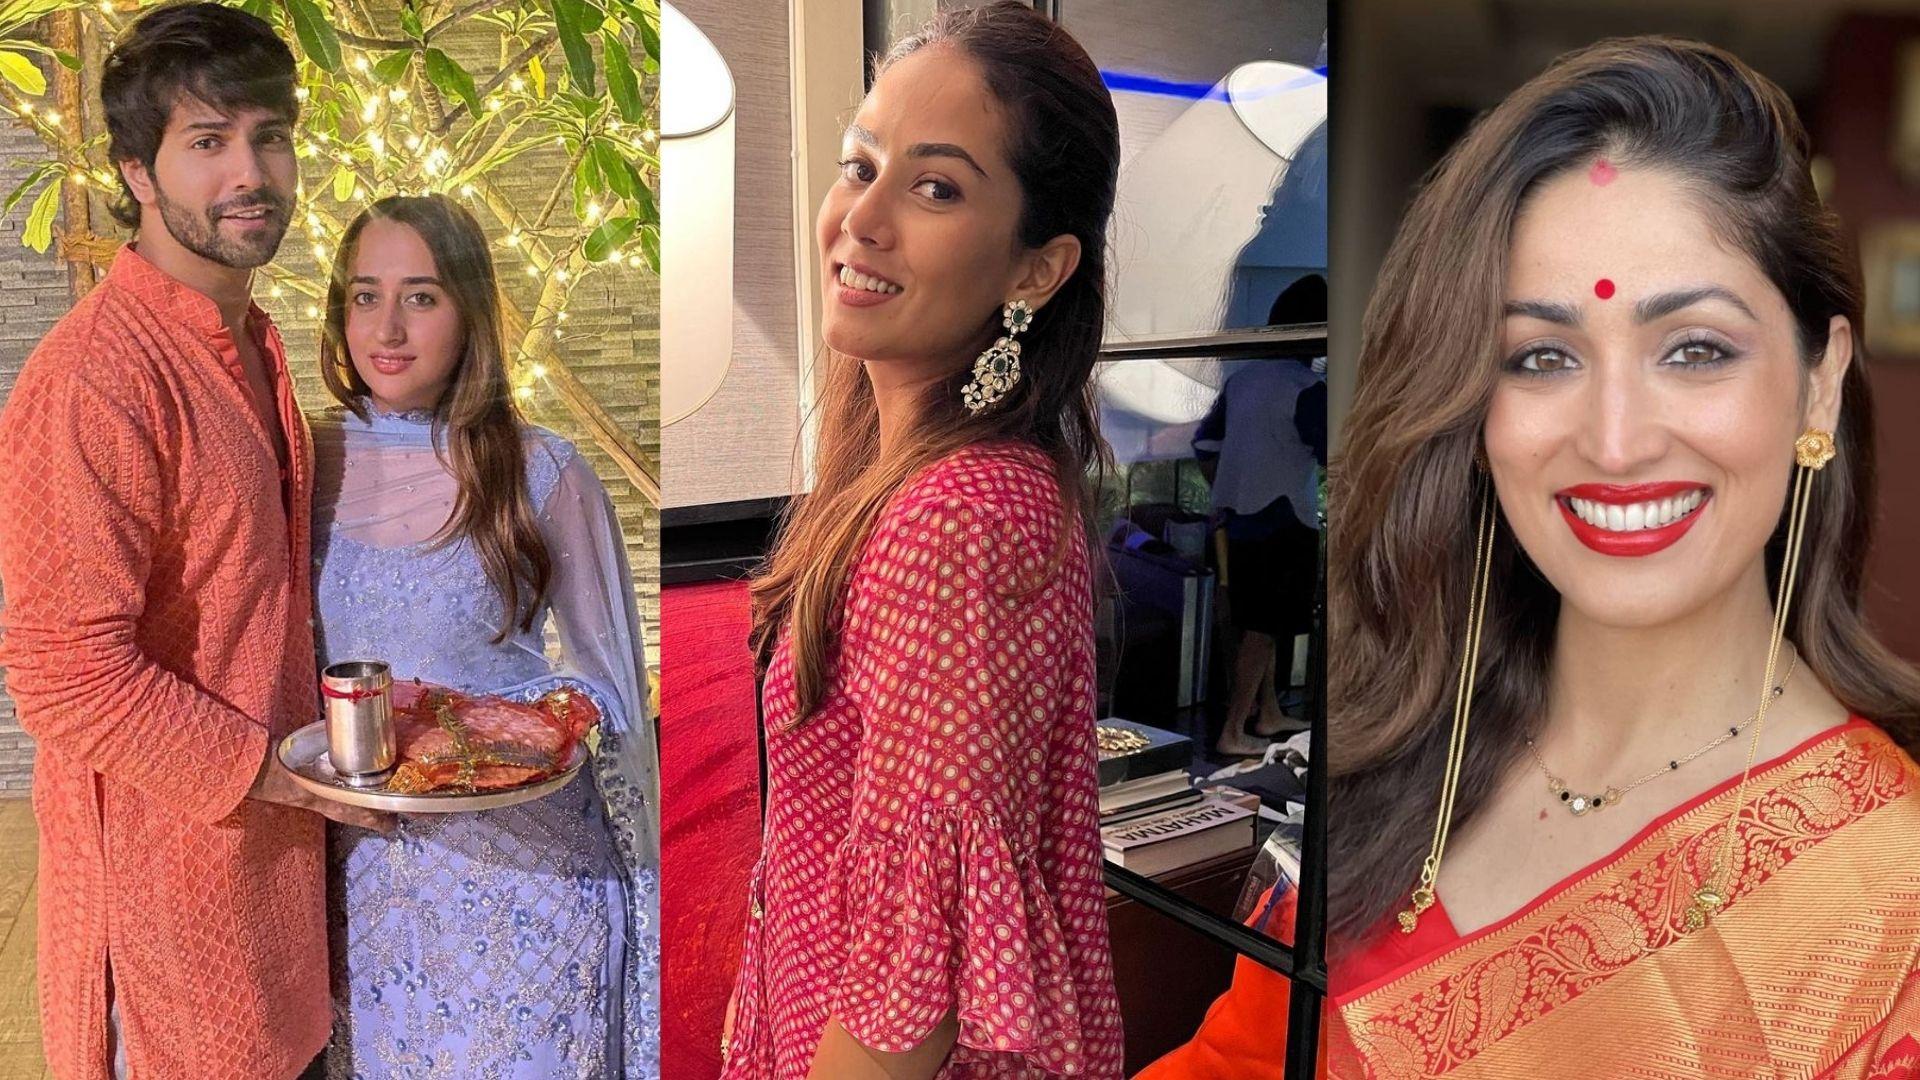 Karwa Chauth 2021: Here's How Varun Dhawan, Natasha Dalal, Yami Gautam Dhar And Mira Rajput Celebrate The Auspicious Occasion